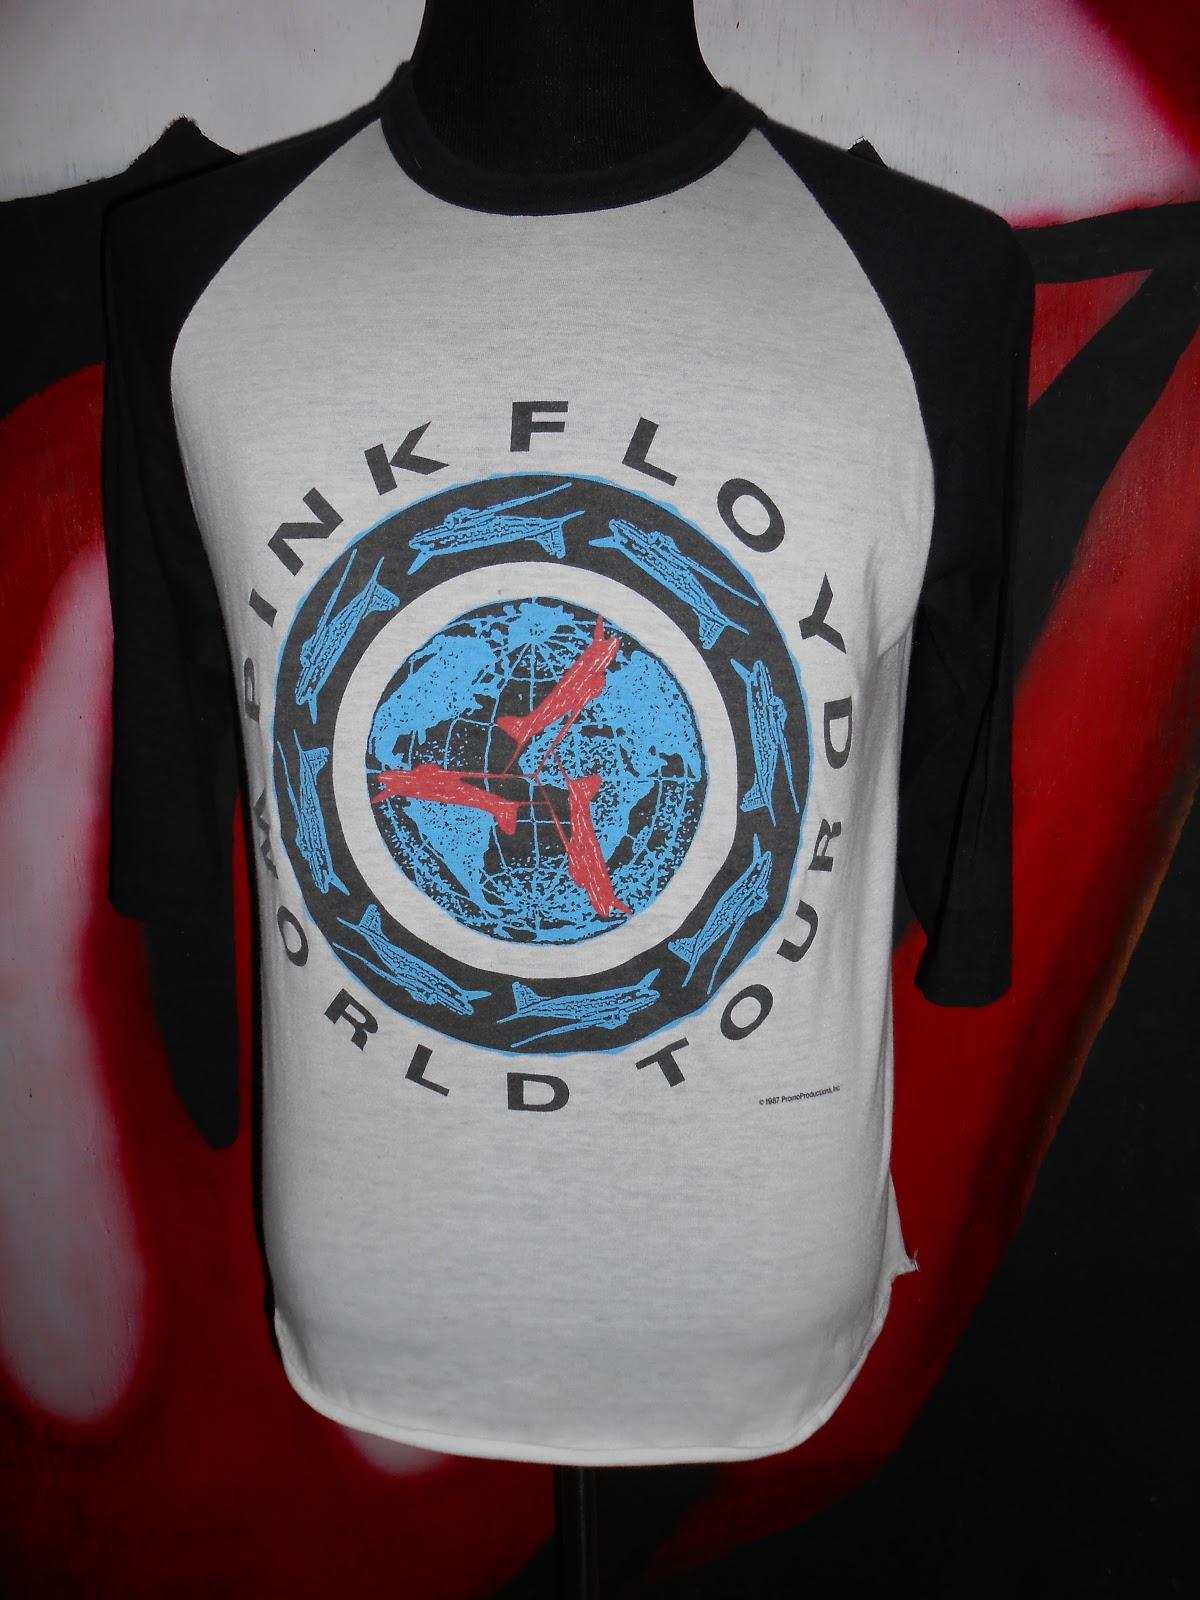 Trend Bundle March 2013 Tendencies Tshirt Beach Kid Hitam Xl Vtg Pink Floyd 3 4 50 Band Tshirtmade In Canada